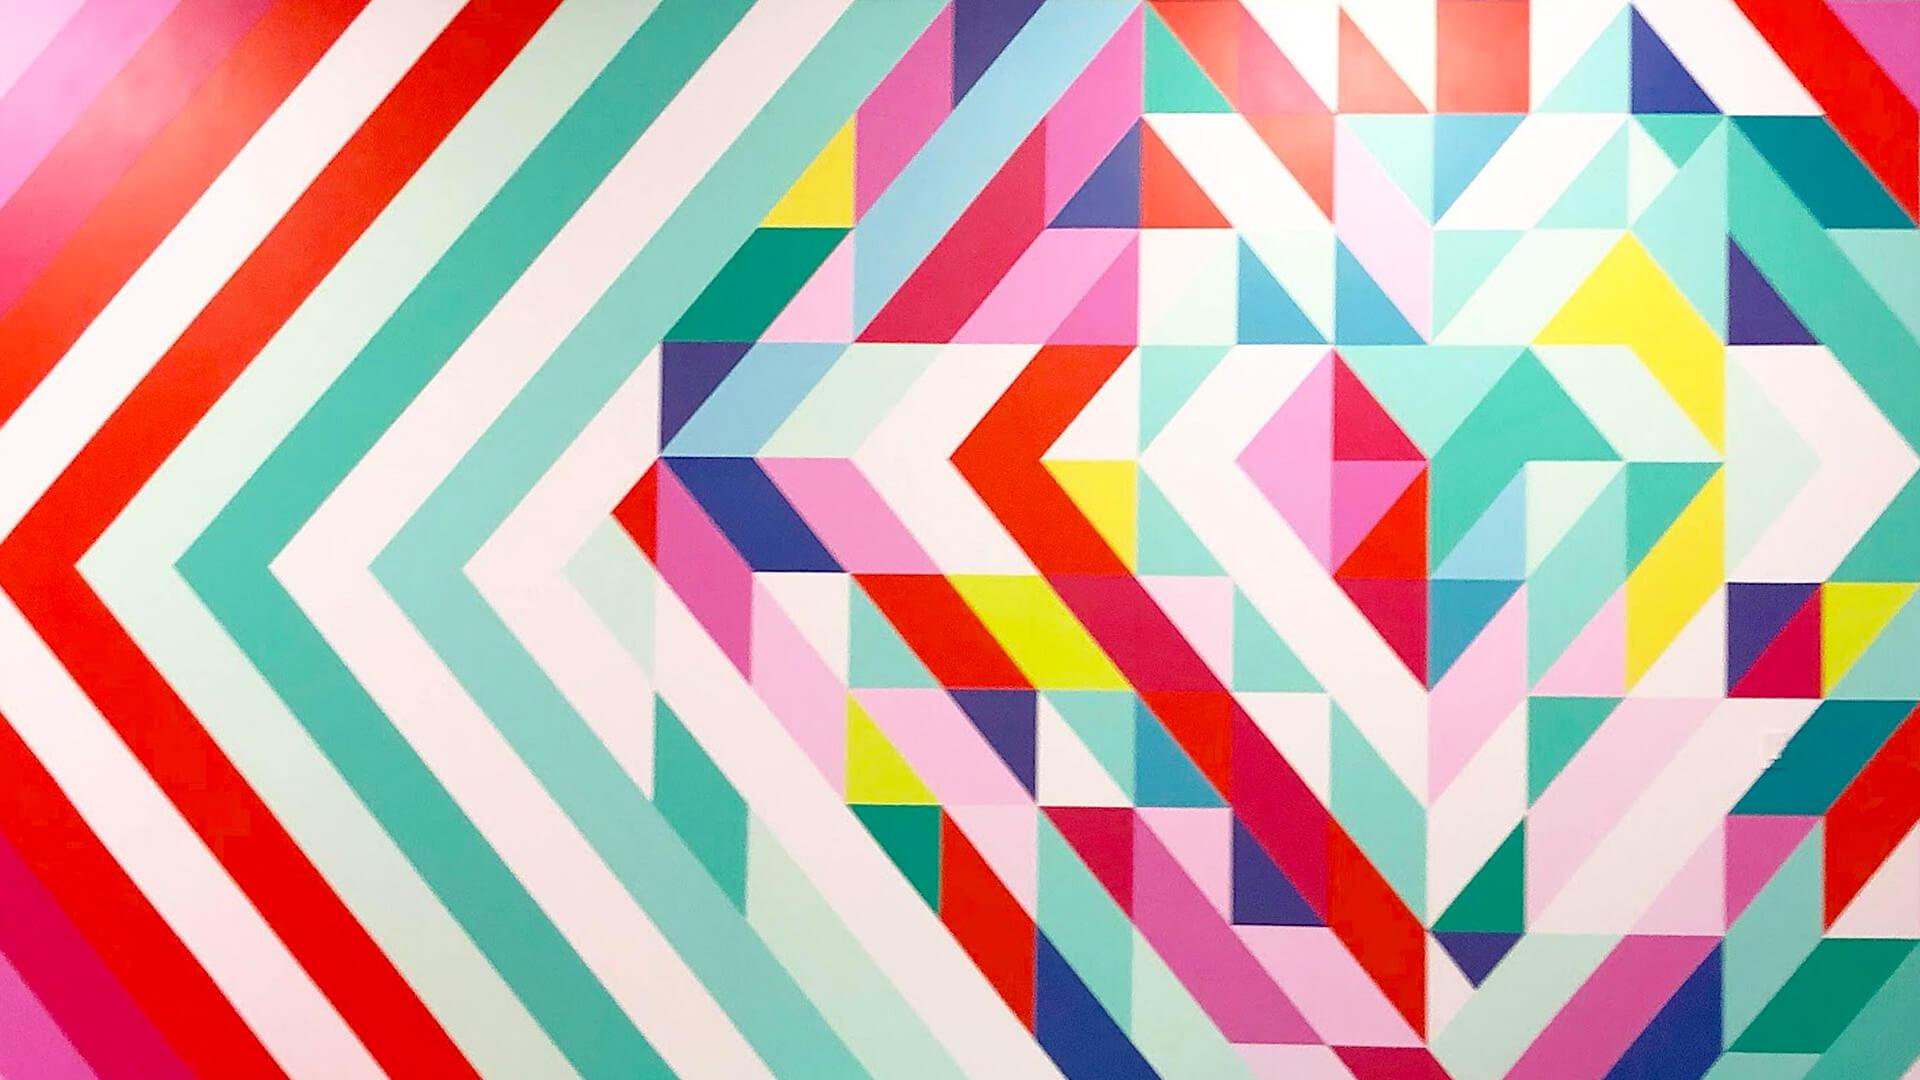 CHROMA YEG - Kingsway - Michelle Hoogveld Rhys Farrell Instagrammable Wall Mural